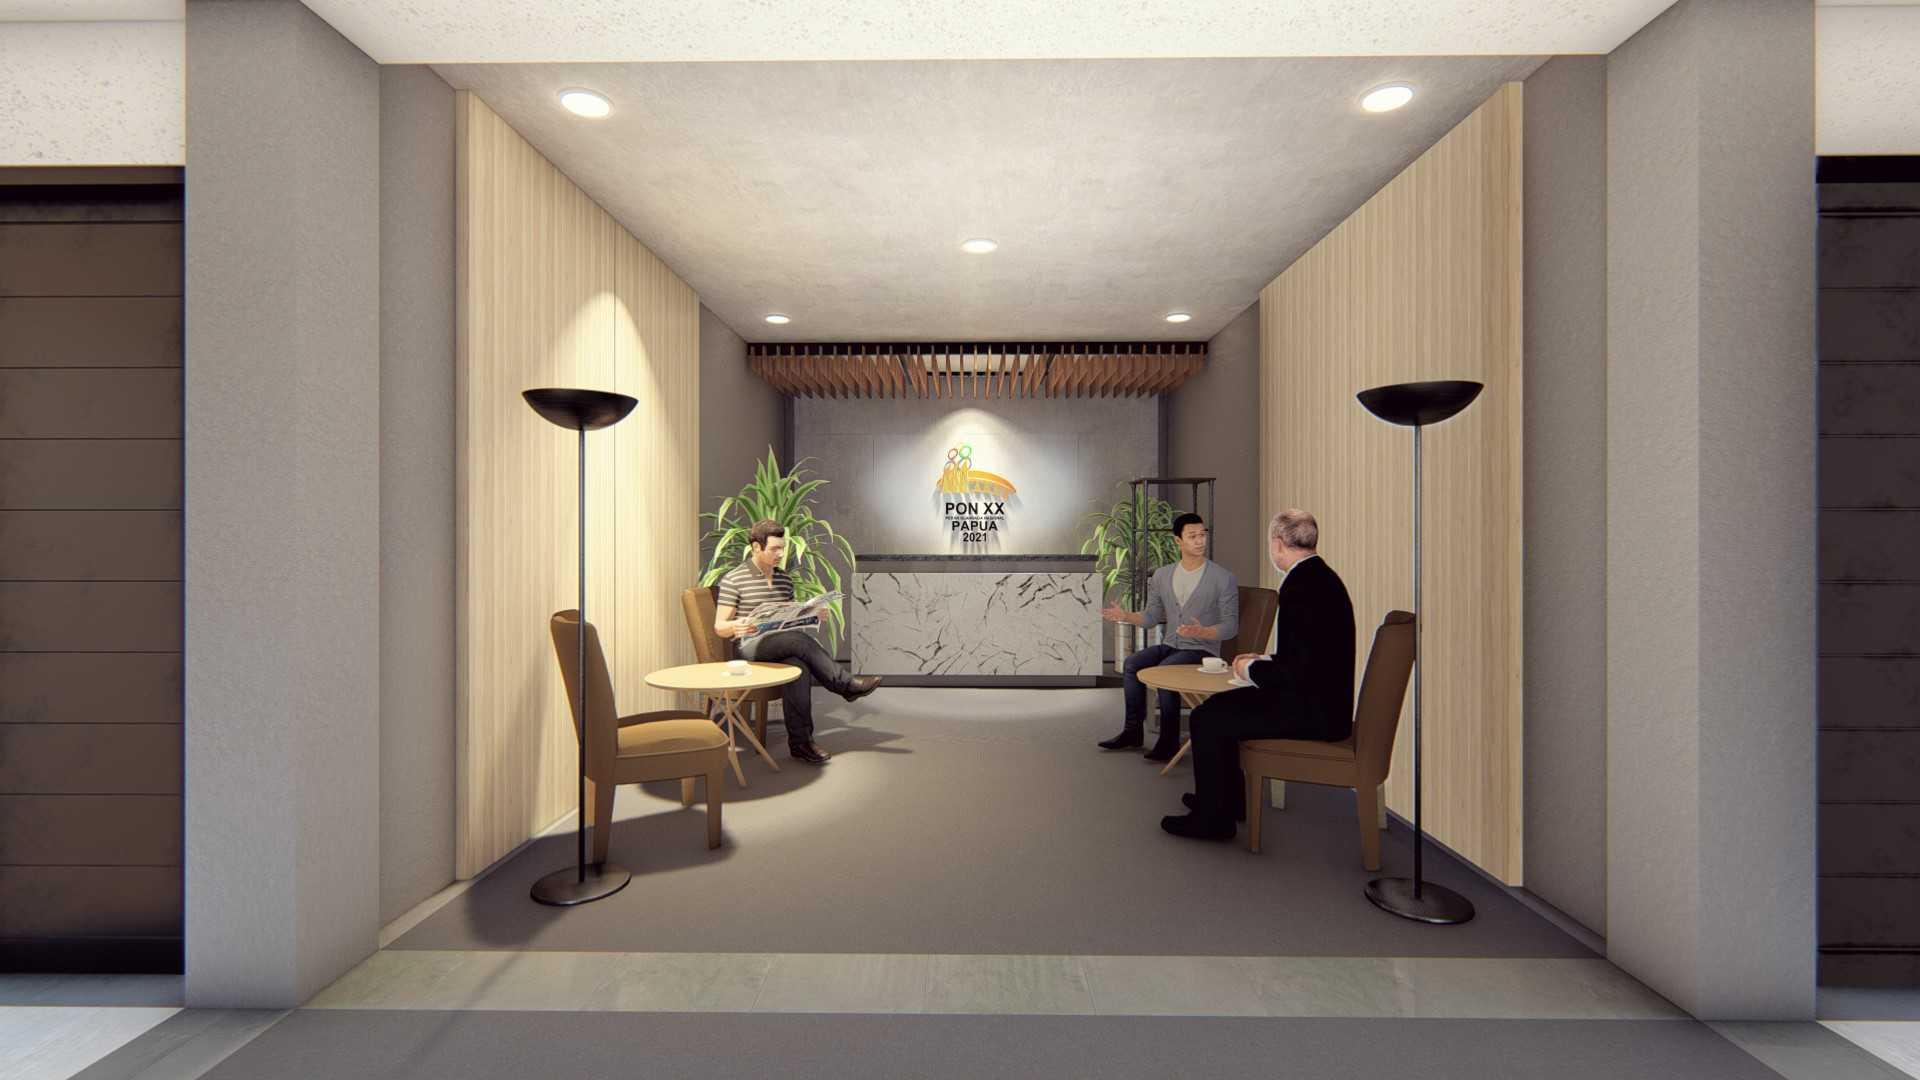 Jasa Arsitek Kihaus Design di Jayapura